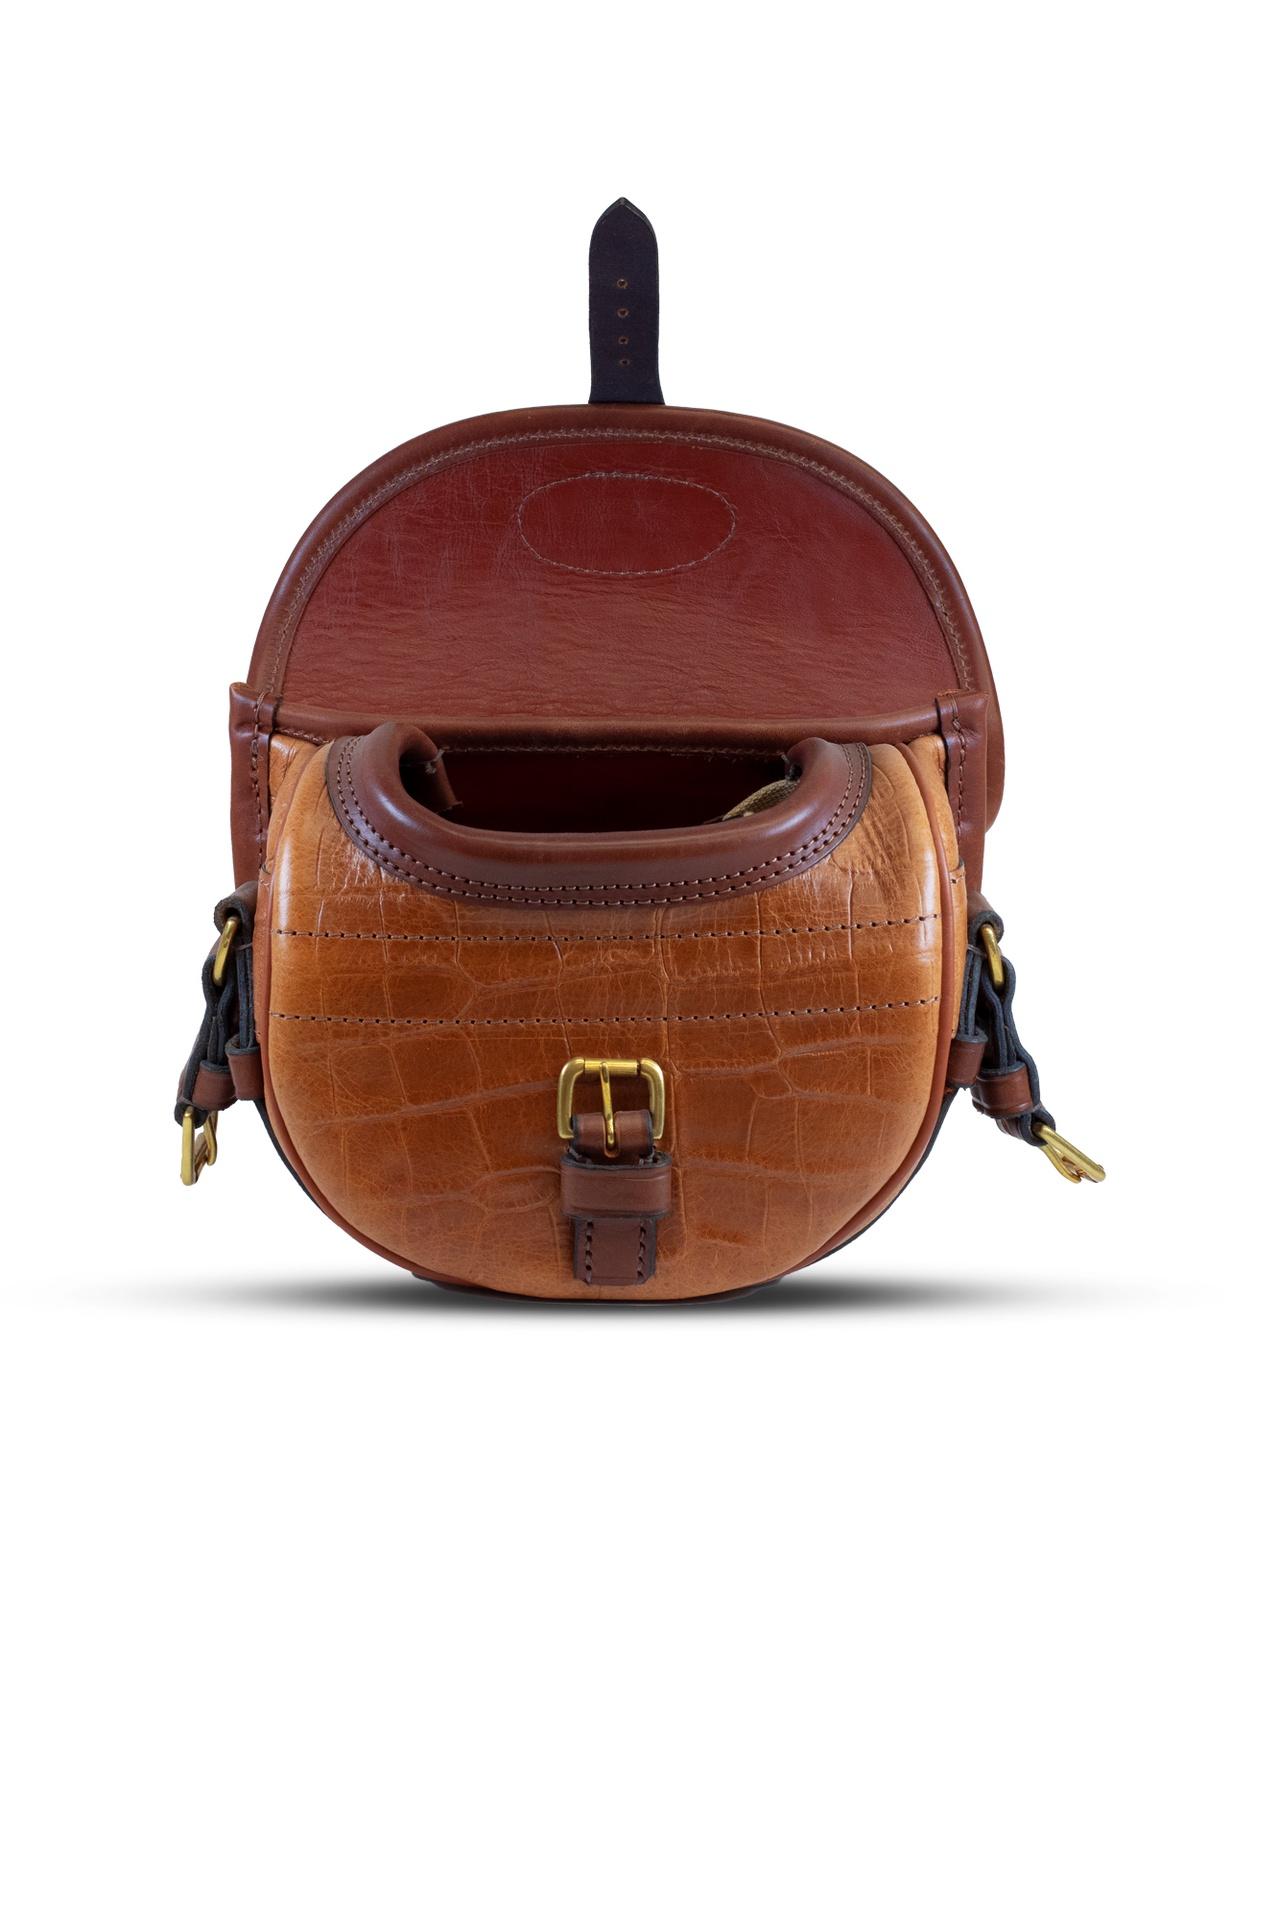 Best Leather Cartridge Bag (75) – Tan/Crocodile Print